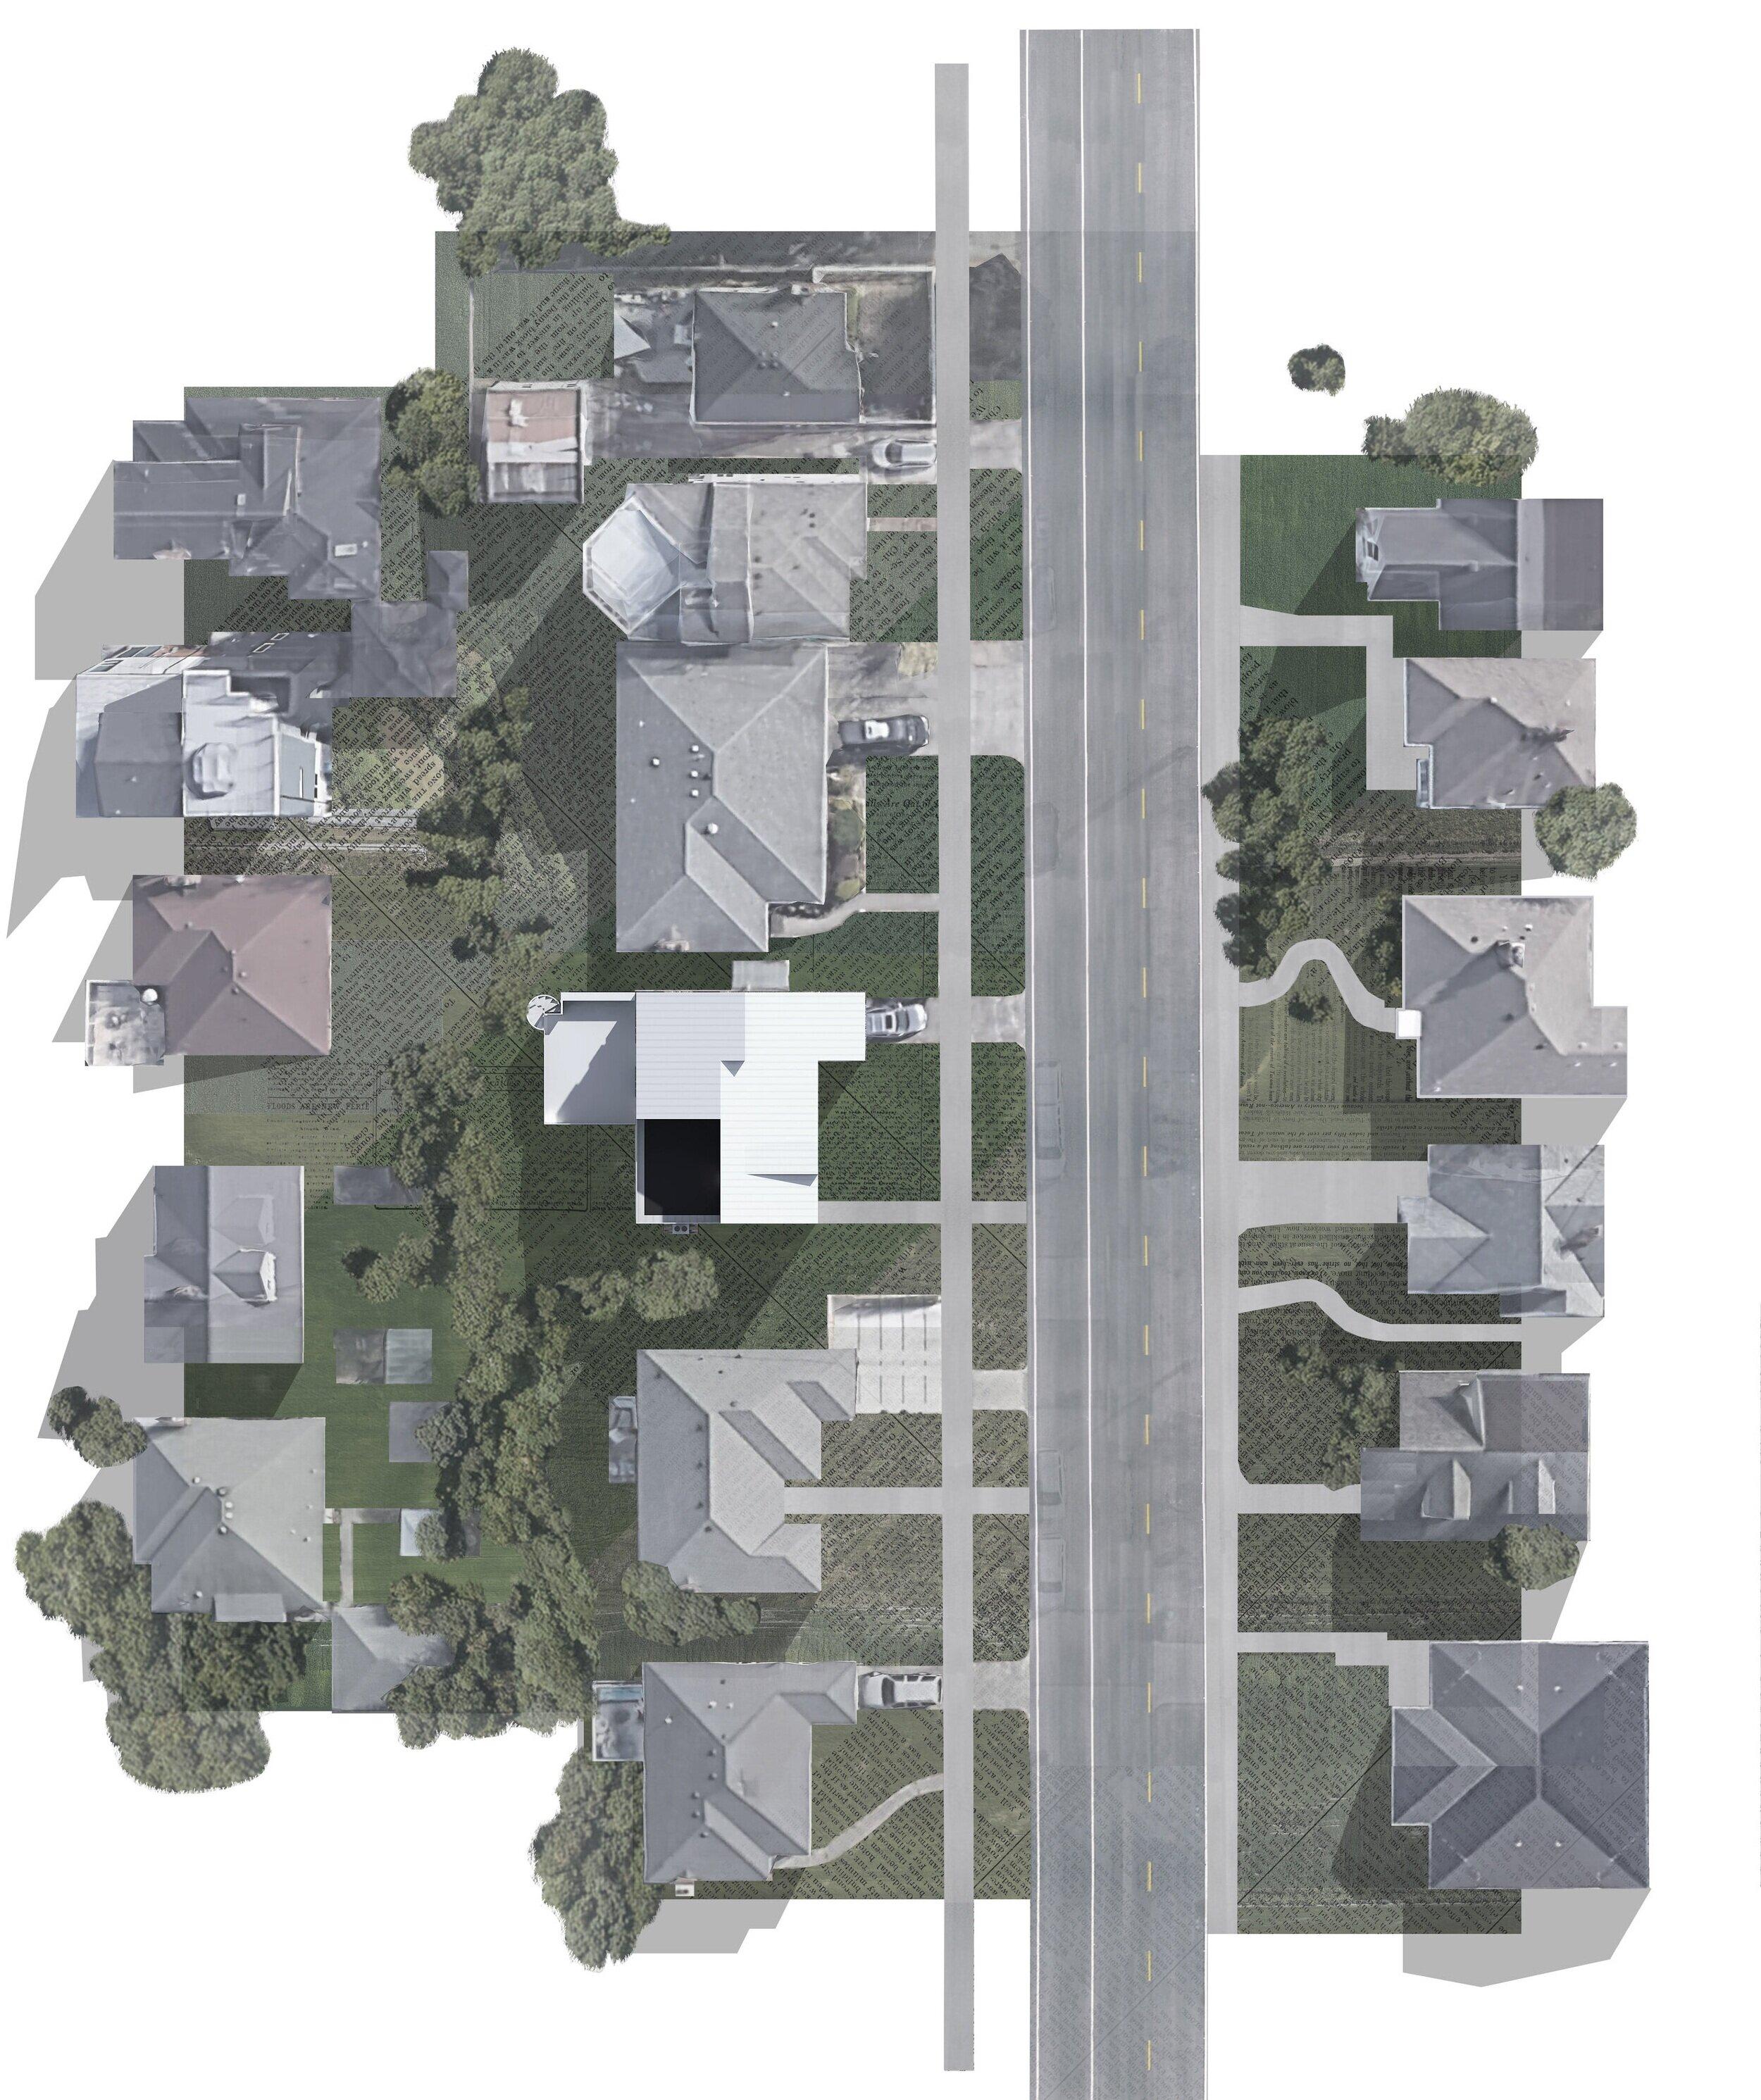 Fogle Home- Site Plan.jpg